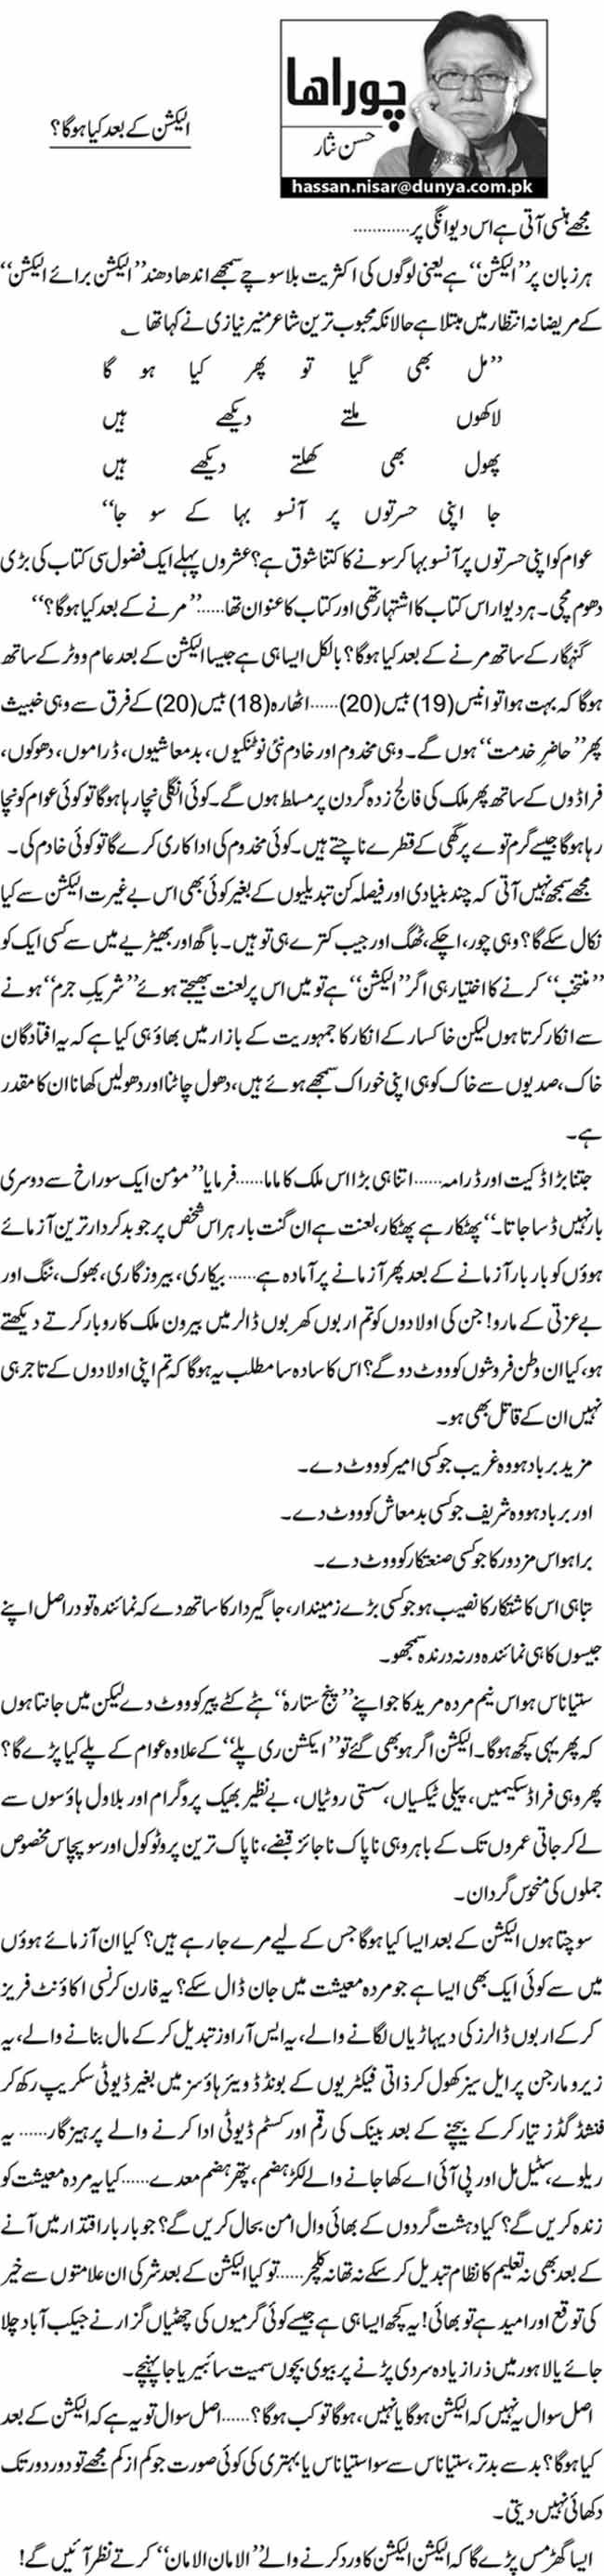 Print Media Coverage Daily Dunya - Hassan Nisar